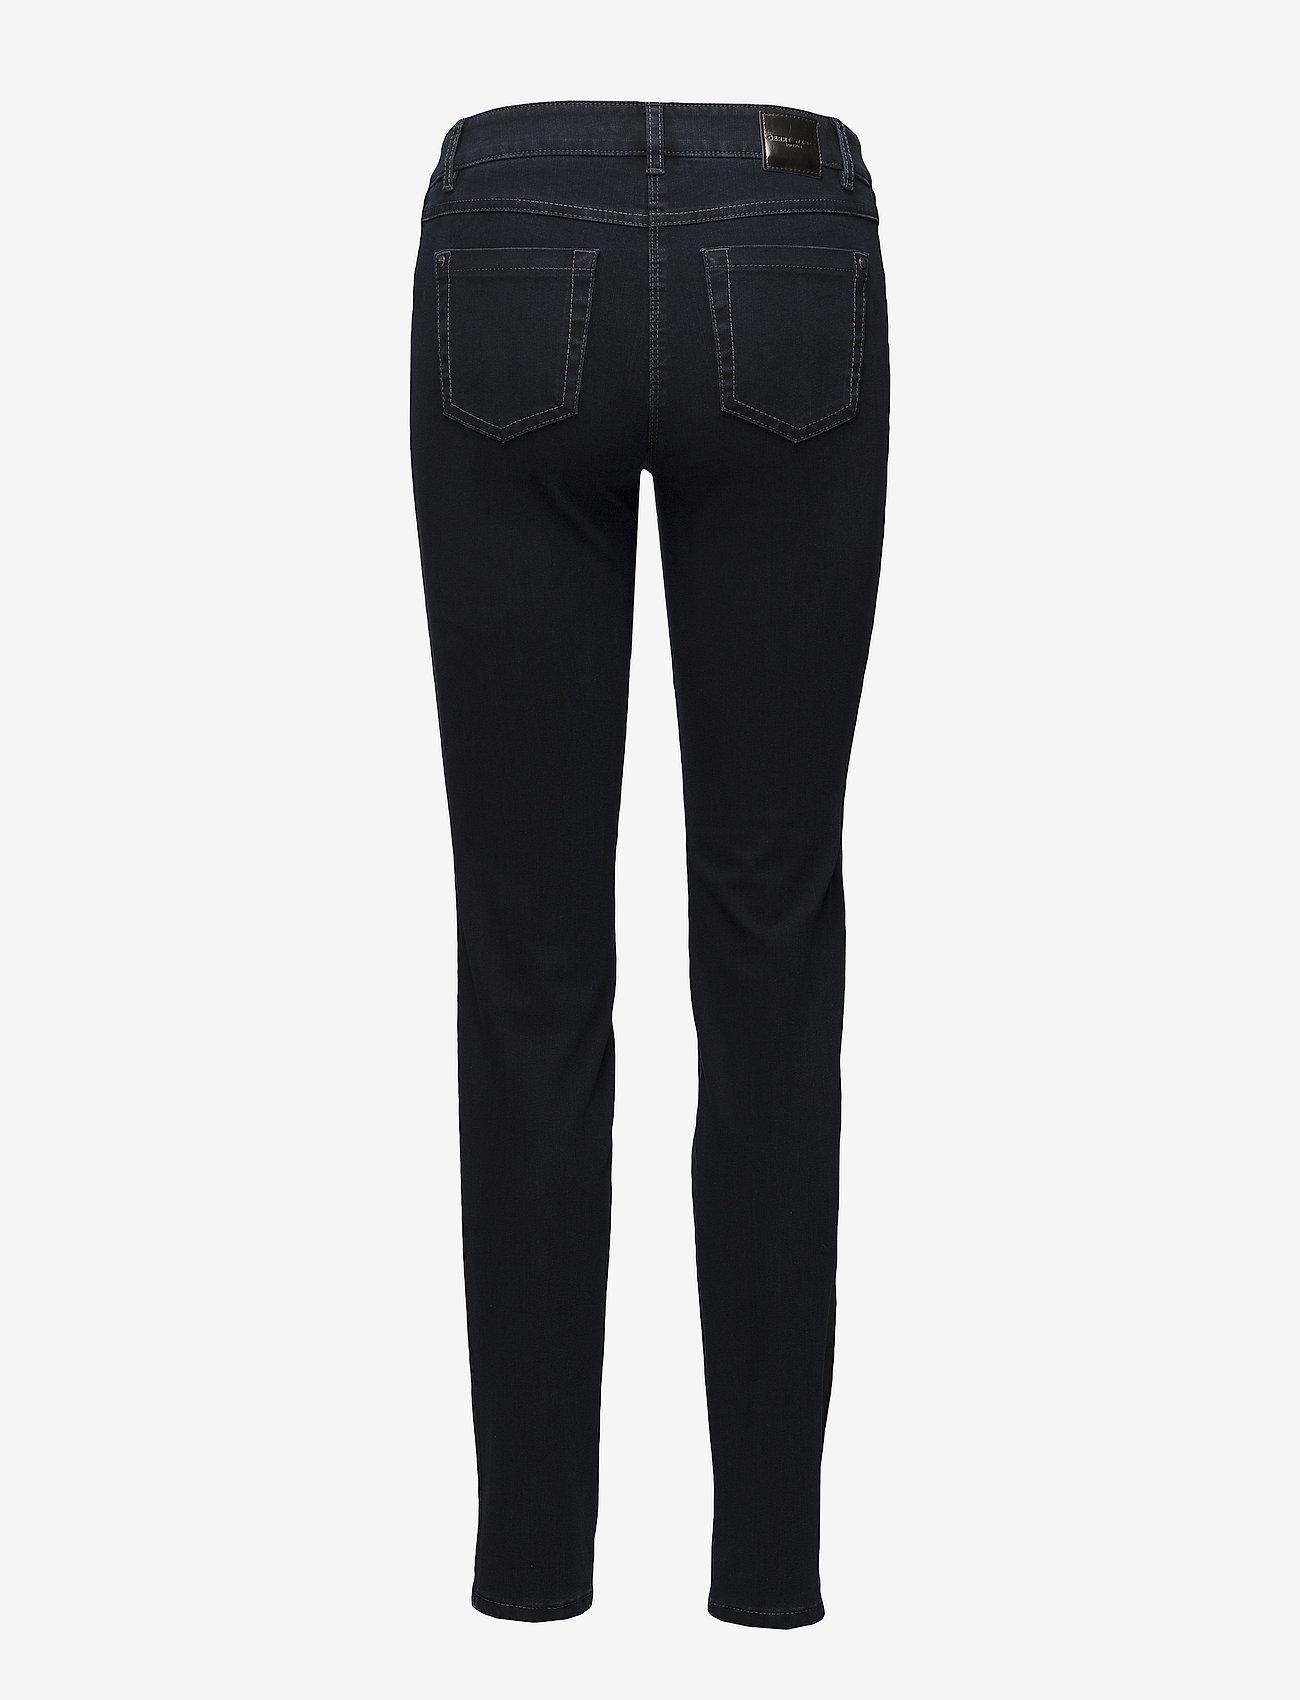 Jeans Long (Dark Blue Denim) (959.40 kr) - Gerry Weber Edition